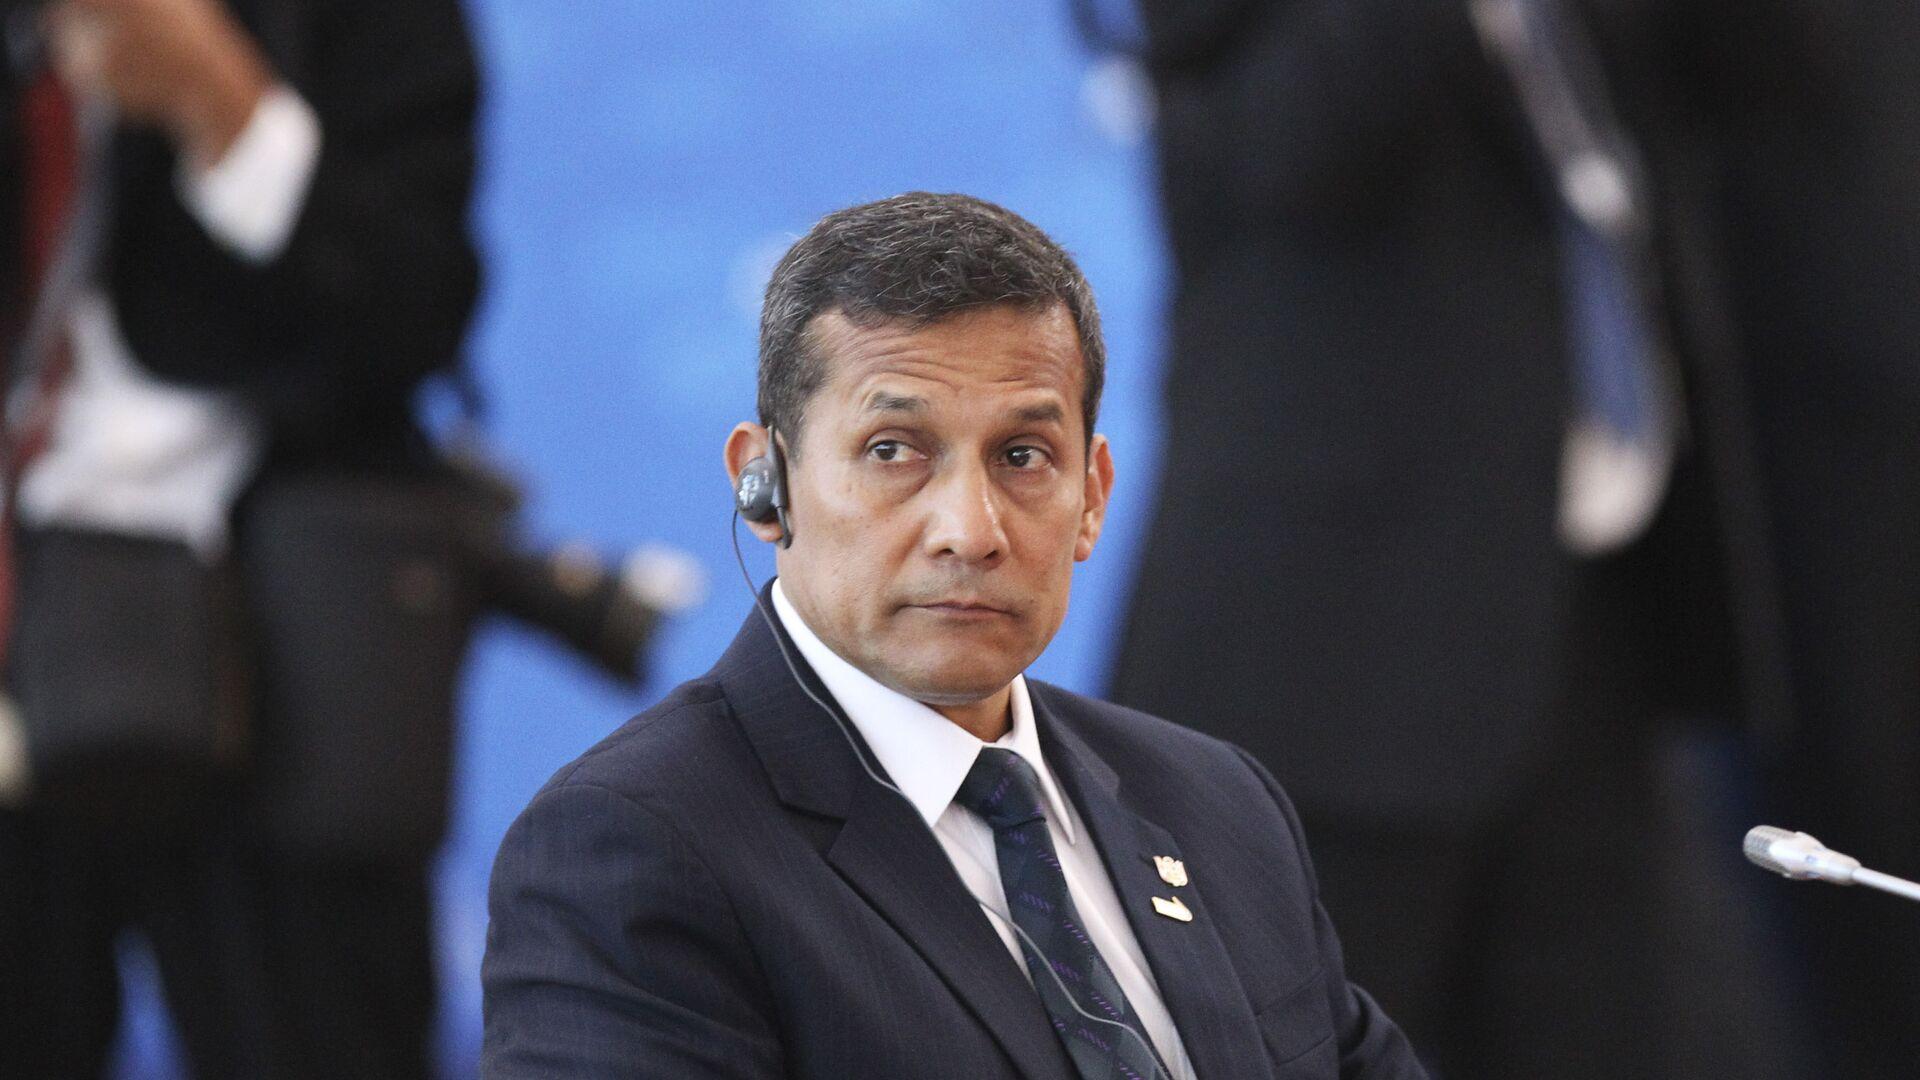 El expresidente de Perú Ollanta Humala  - Sputnik Mundo, 1920, 07.04.2021